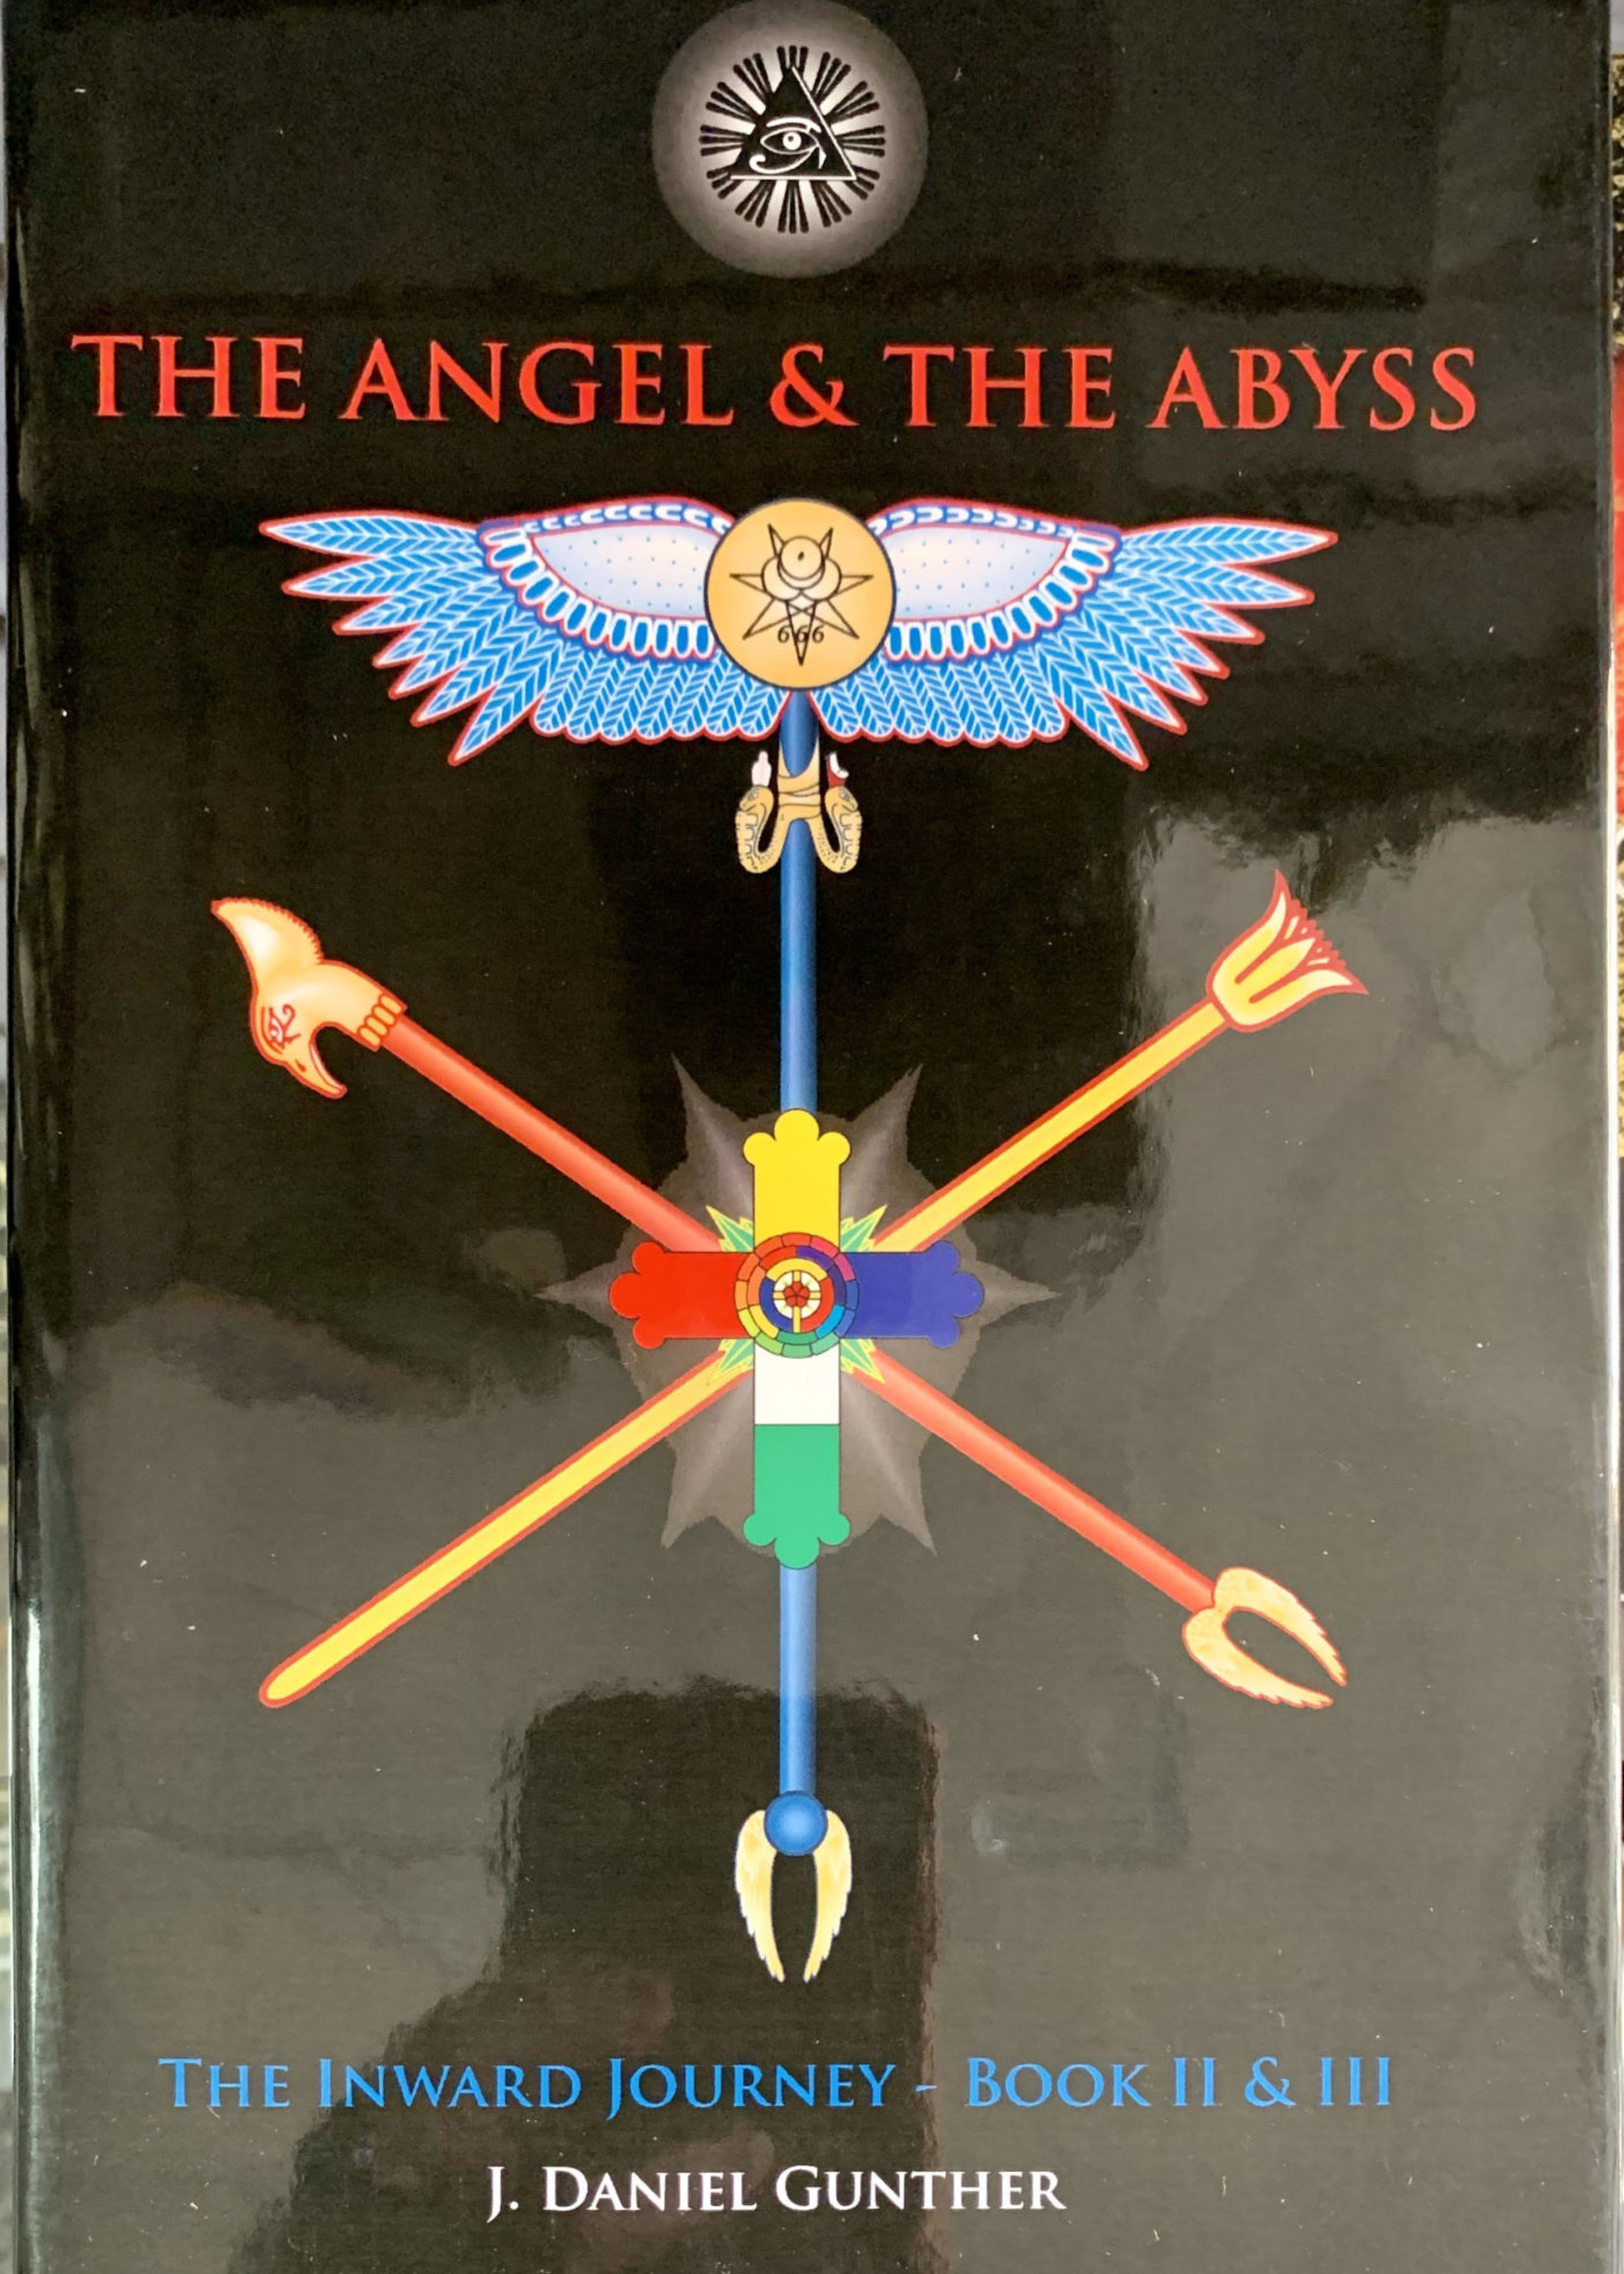 The Angel & The Abyss The Inward Journey, Books II & III - J. Daniel Gunther